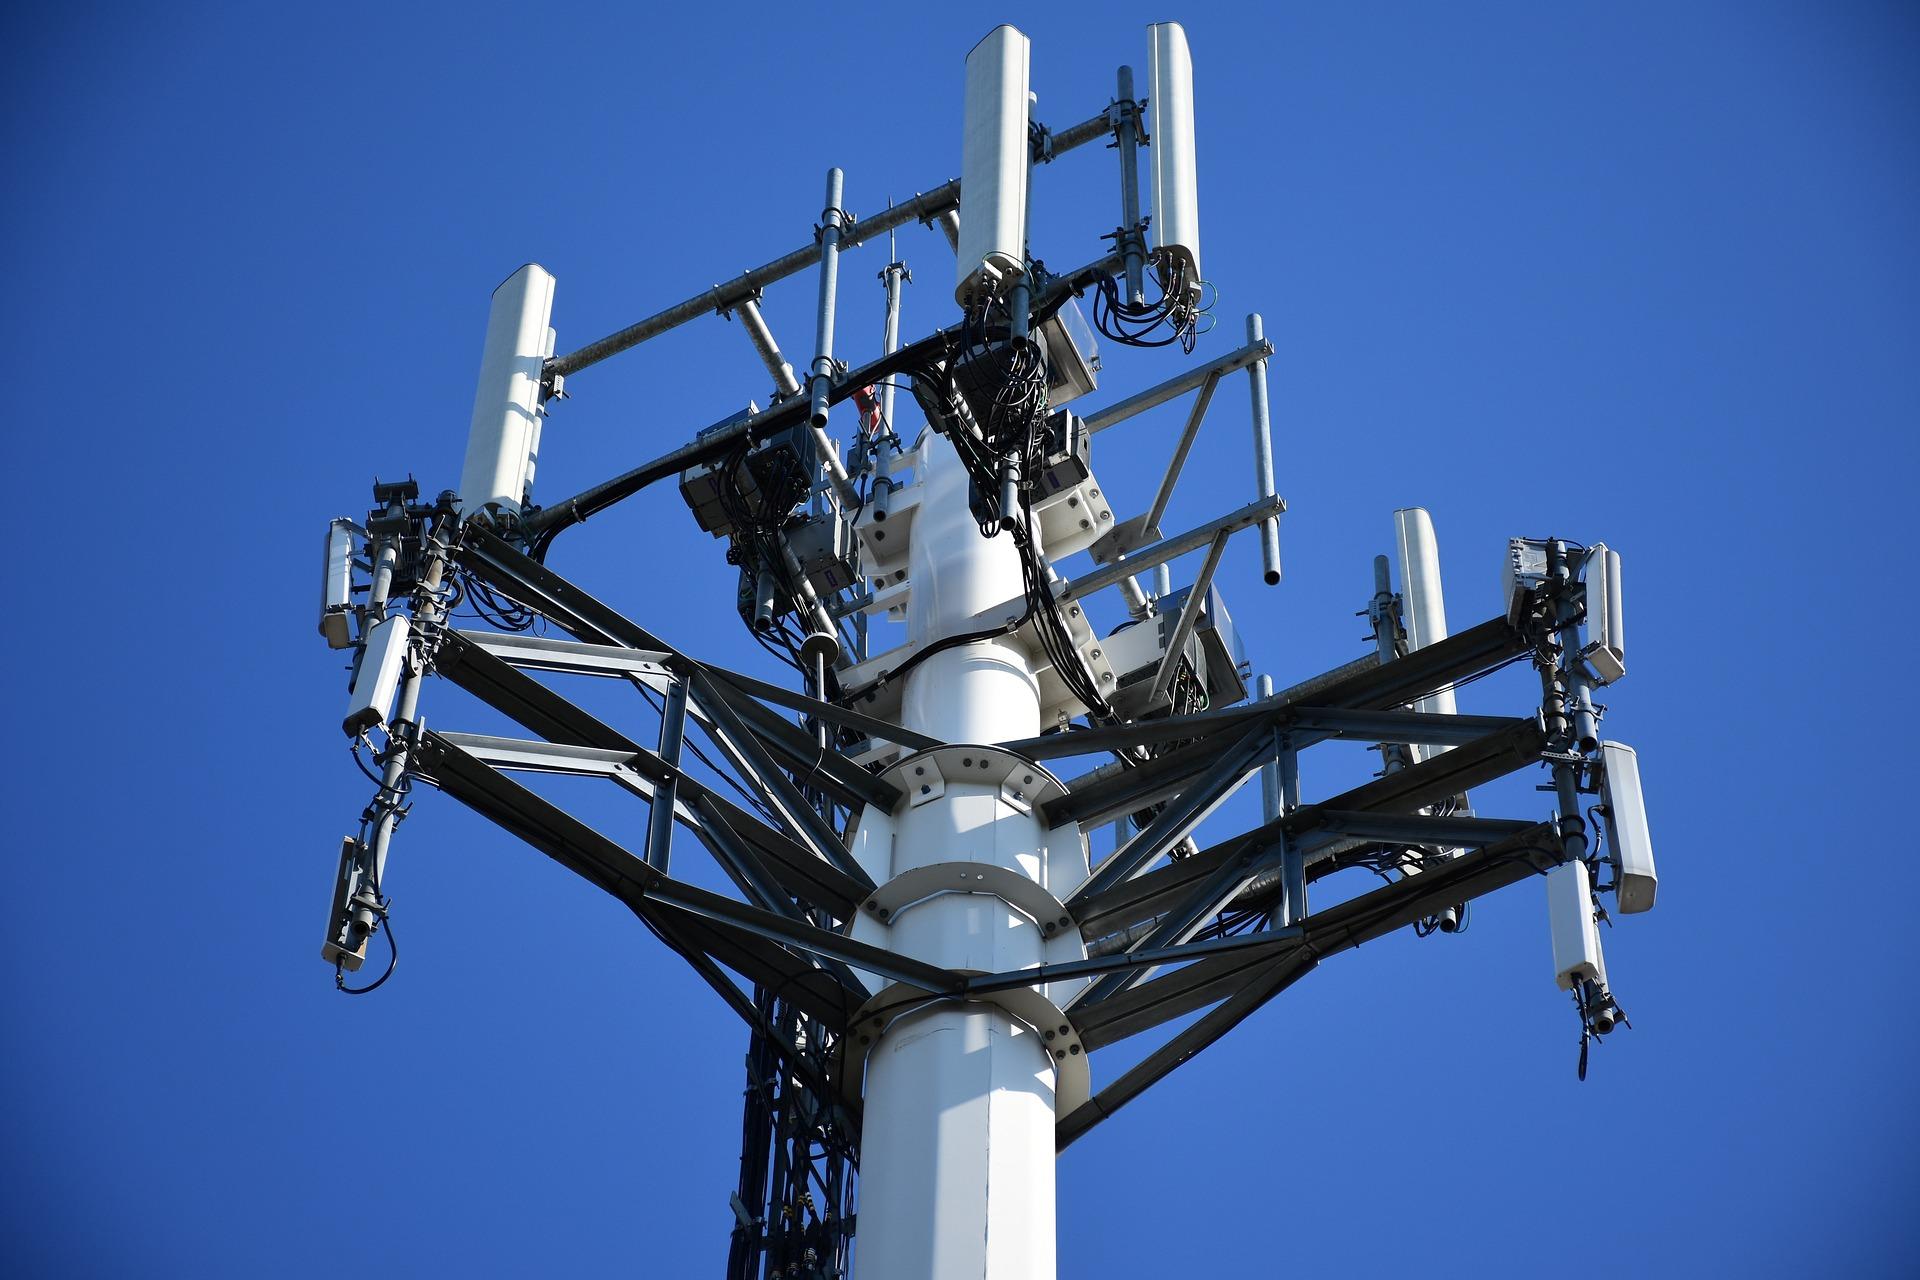 Pixabay – Telecom Tower III